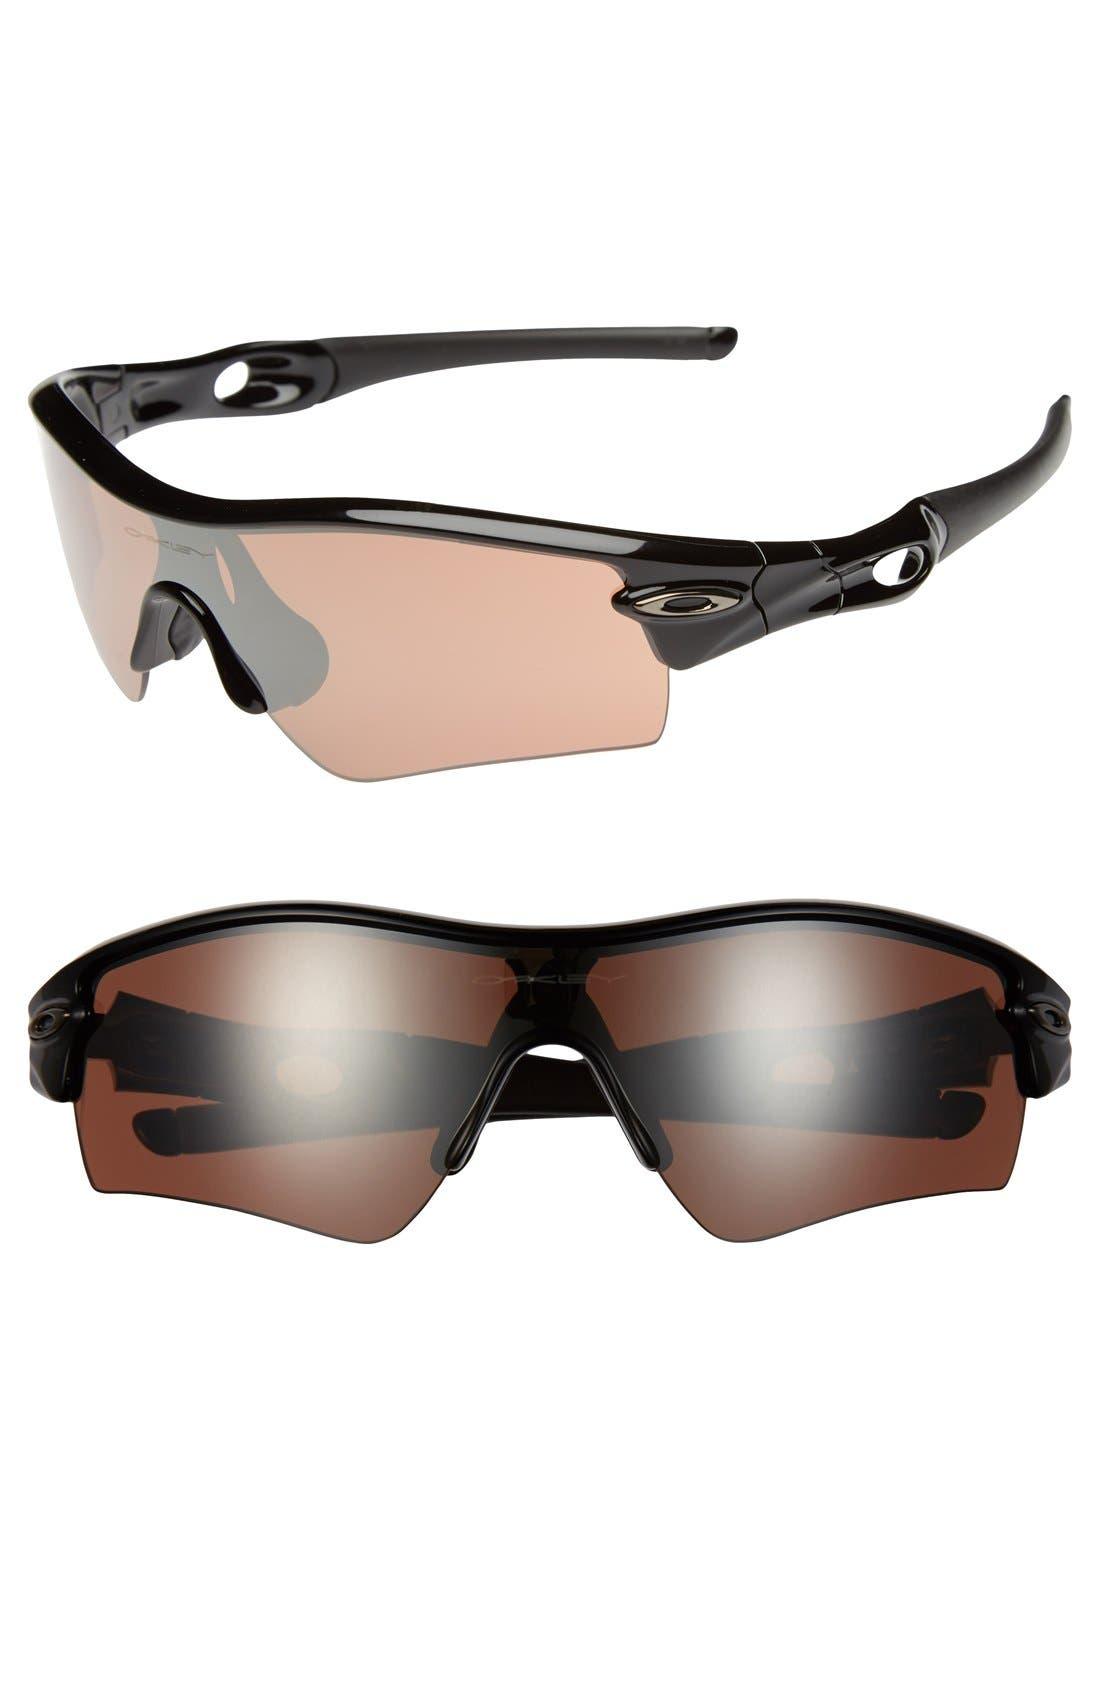 Main Image - Oakley 'Radar Path' 155mm Shield Sunglasses